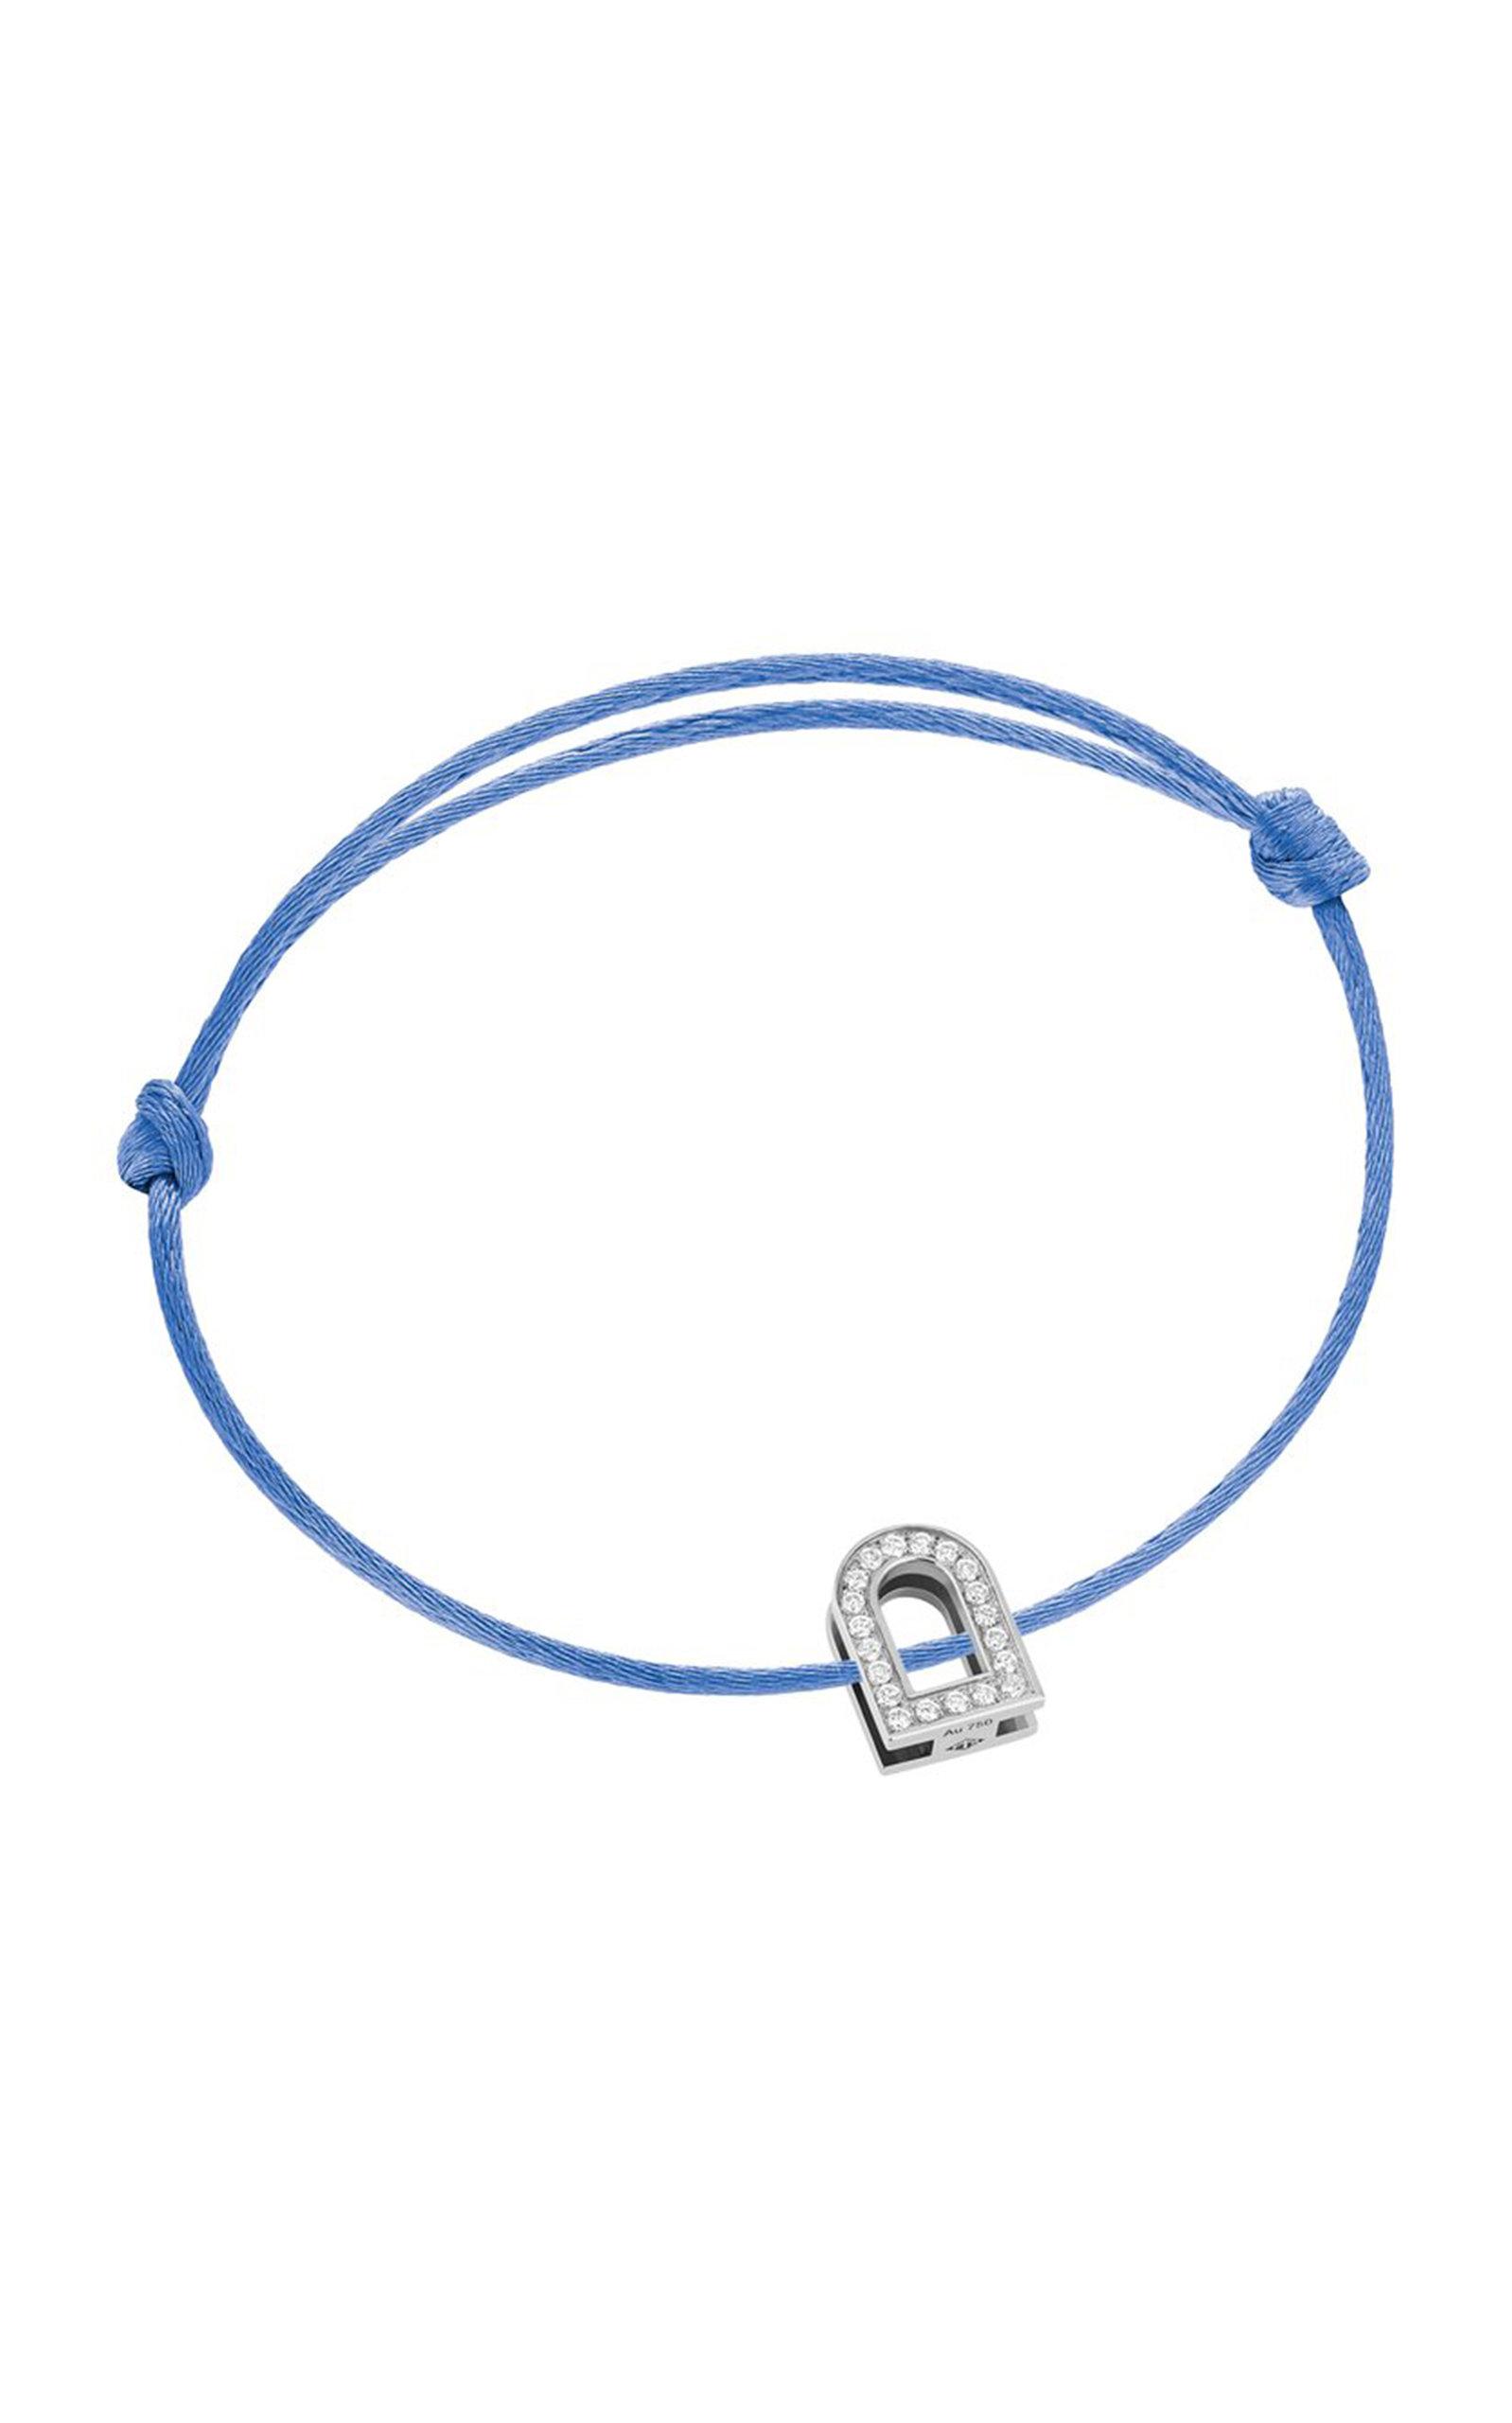 Women's L'Arc Voyage 18K White Gold; Diamond and Silk Cord Bracelet